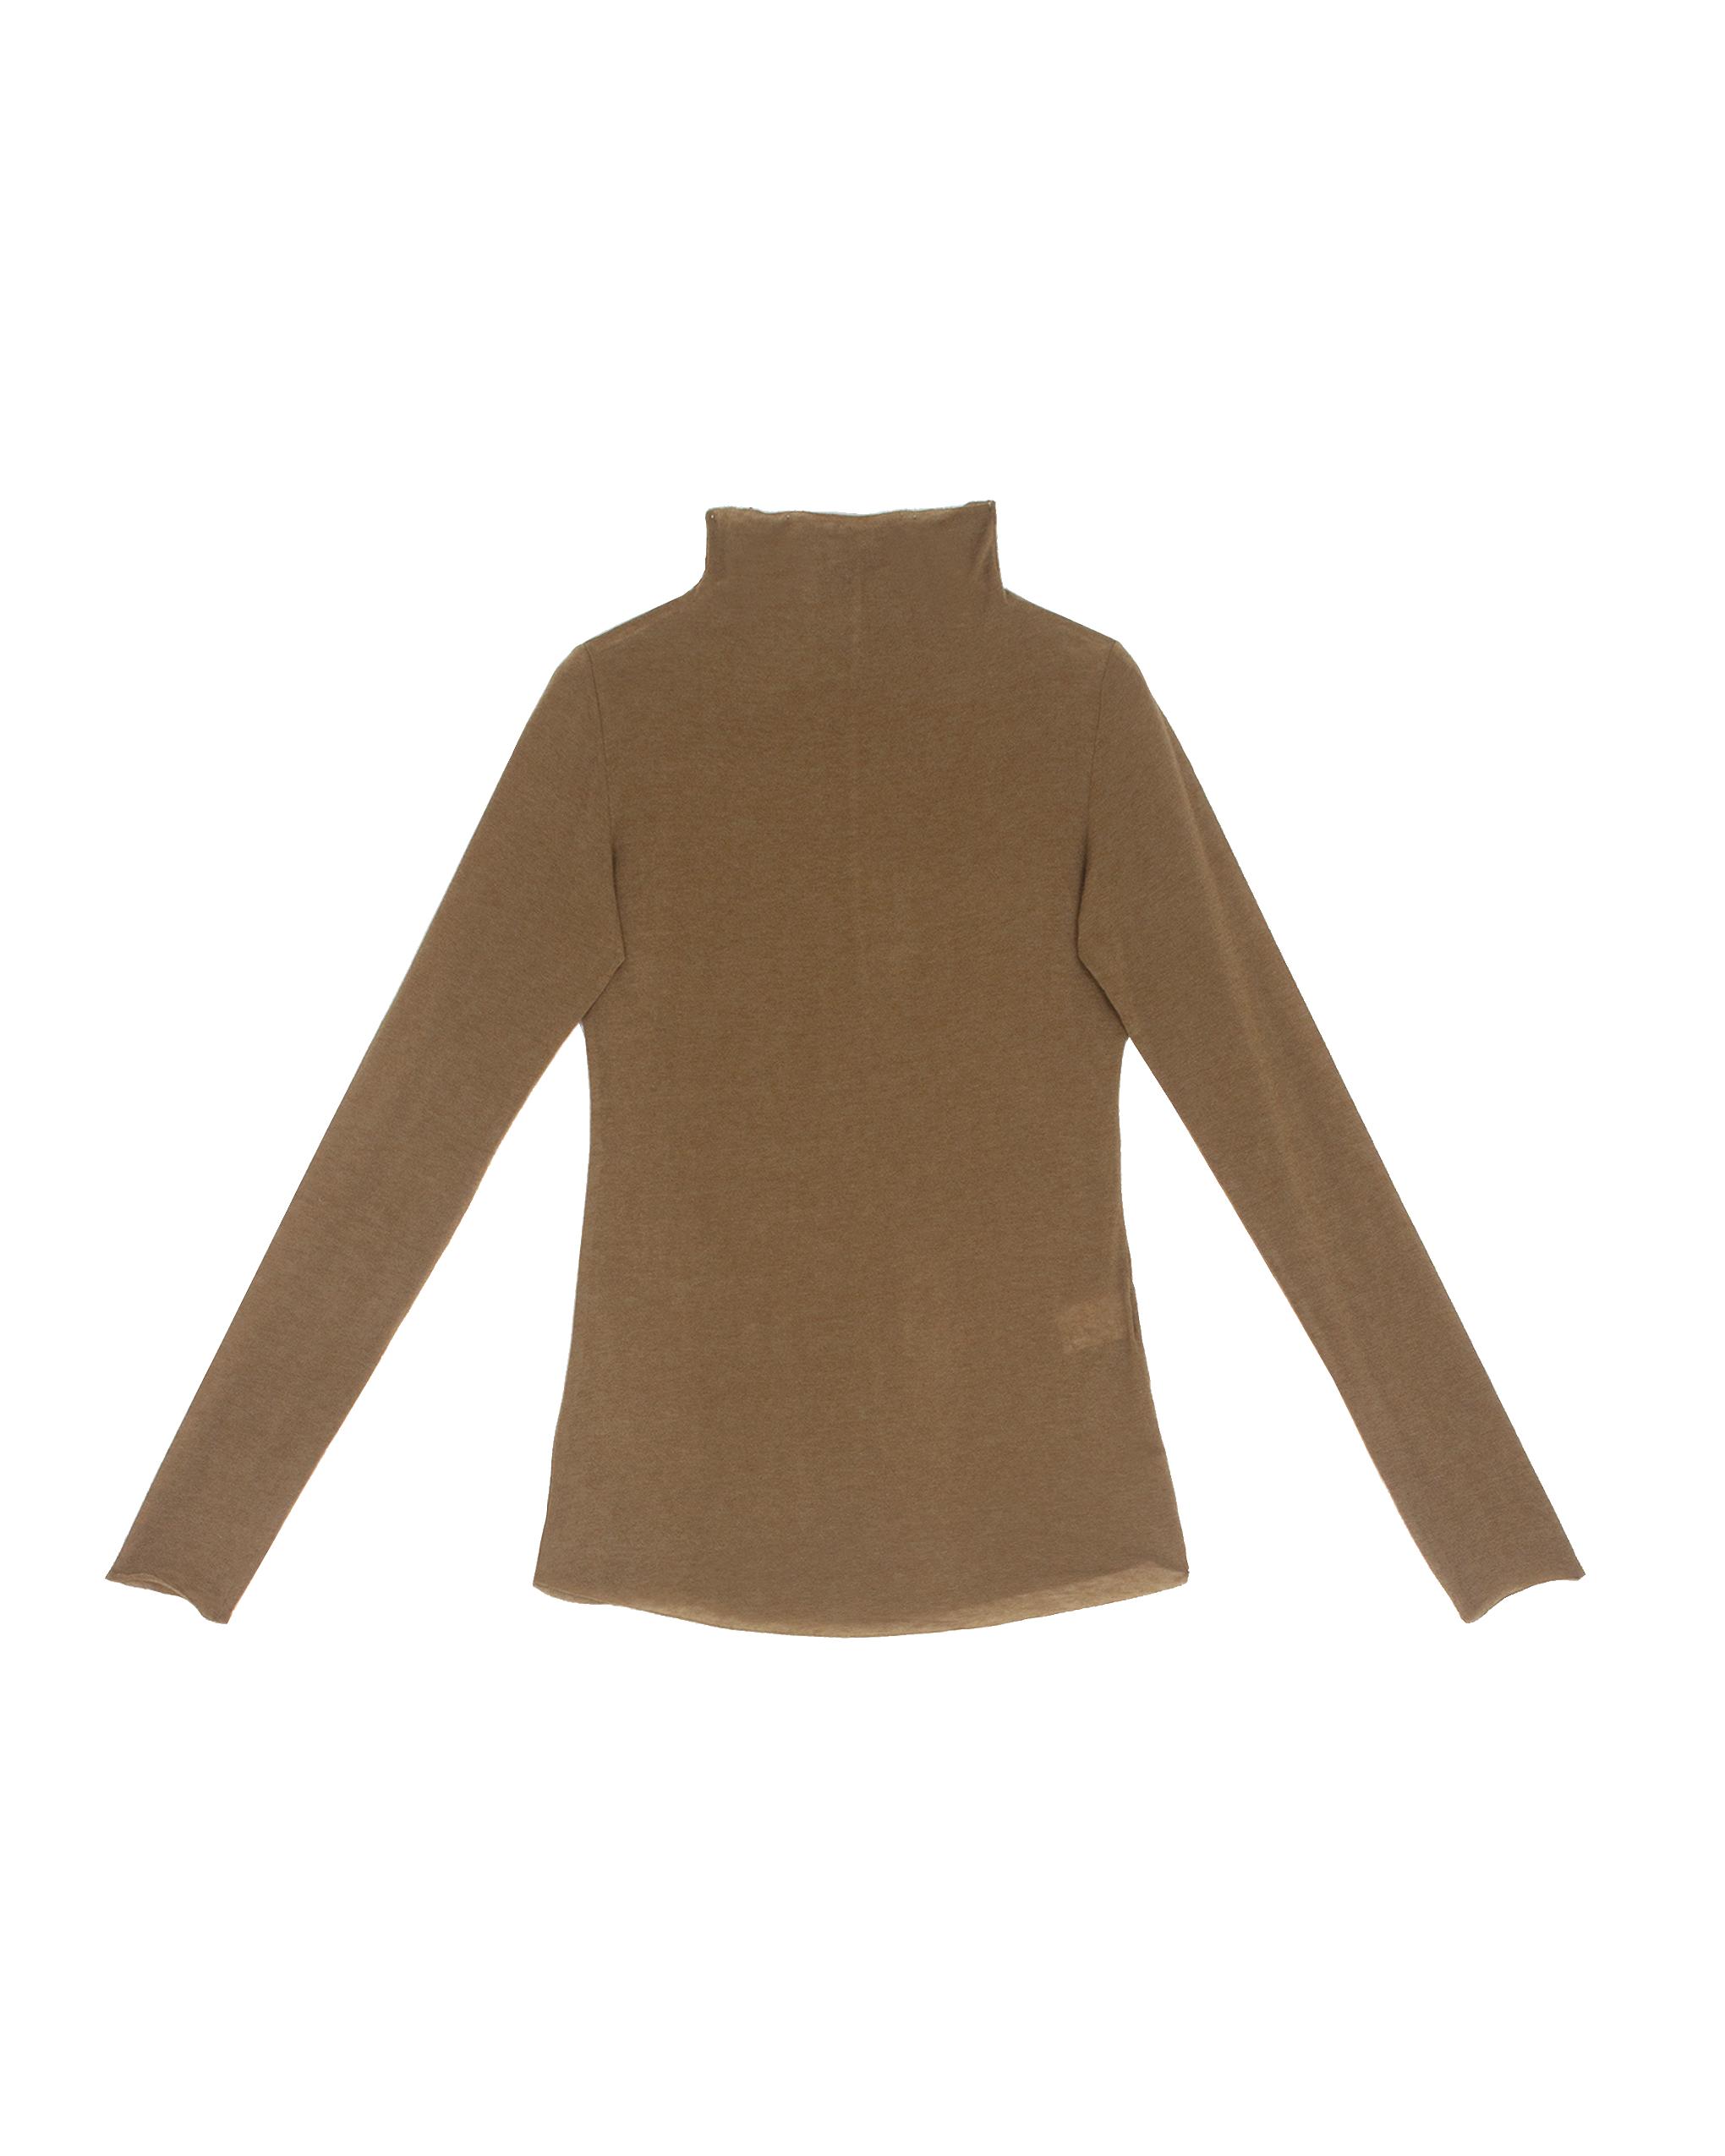 EMIN + PAUL khaki second skin wool blouse.